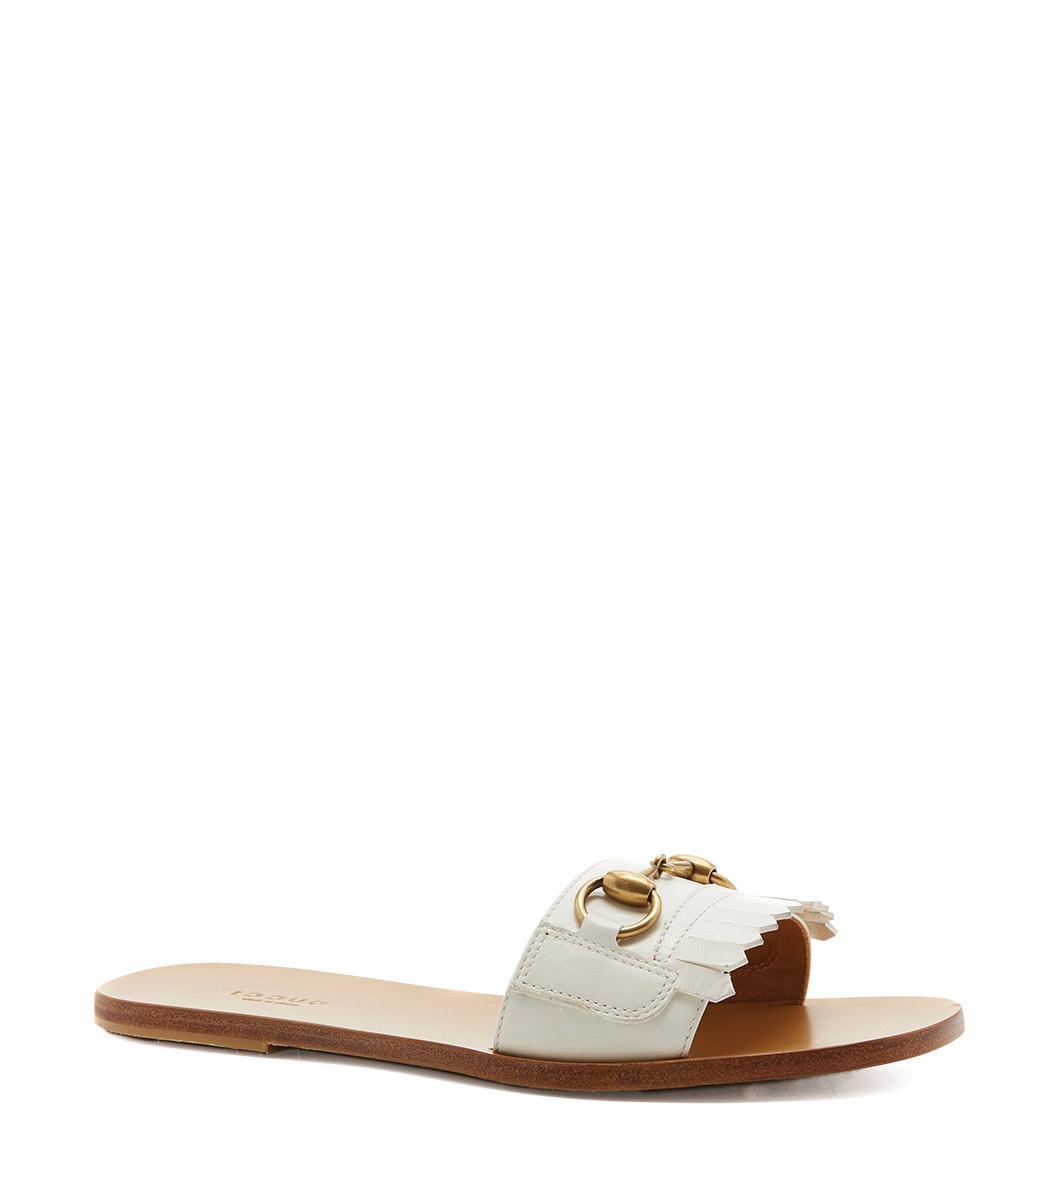 c0f1e6944 Gucci Women s Varadero Fringe Leather Slide Sandals In 9110 White.  ShopBAZAAR. 650Login to see price